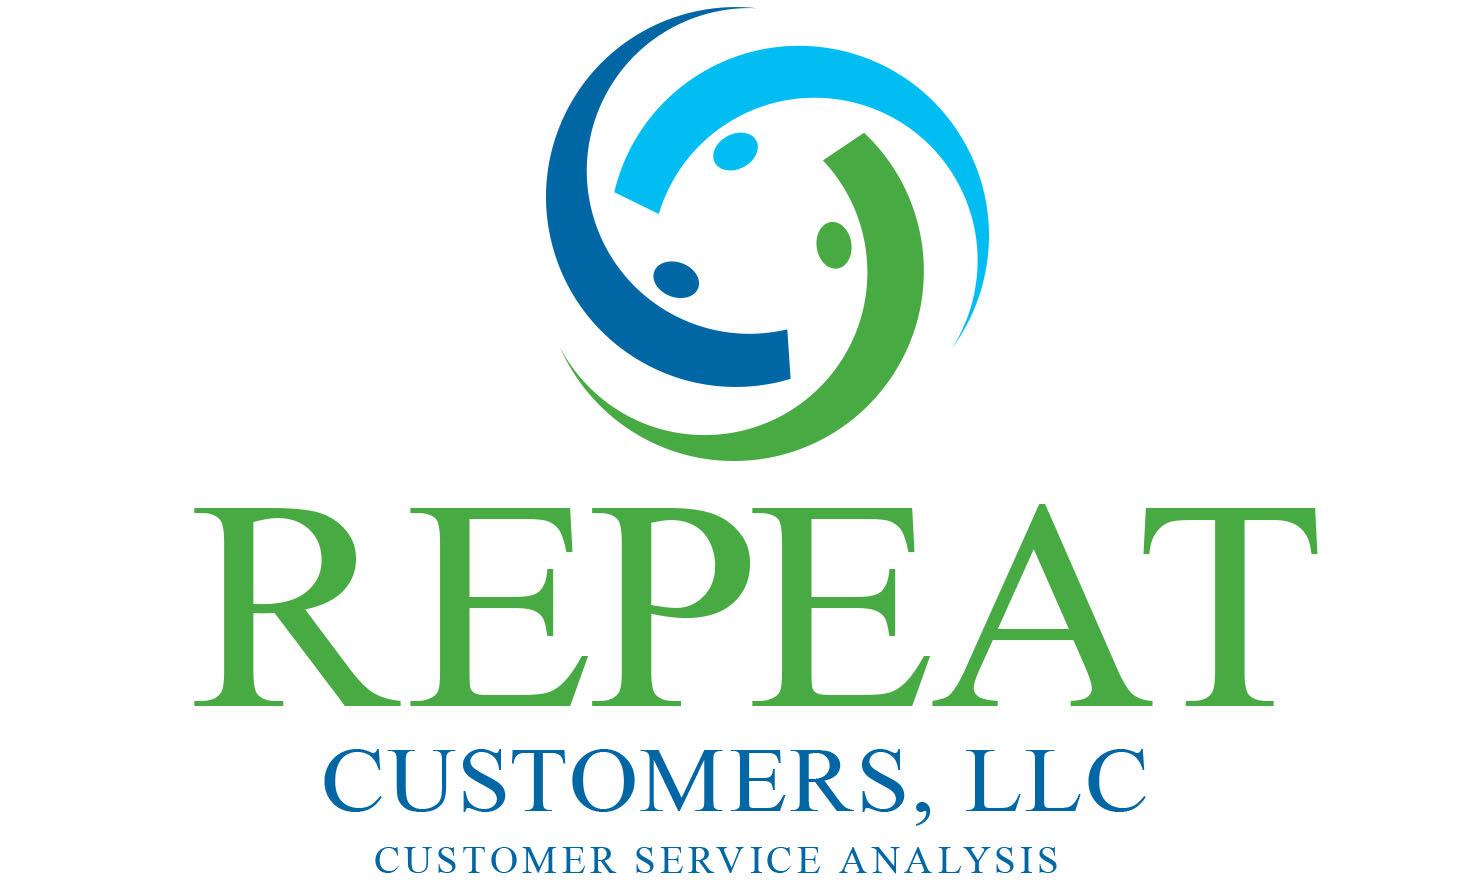 Repeat Customers, LLC